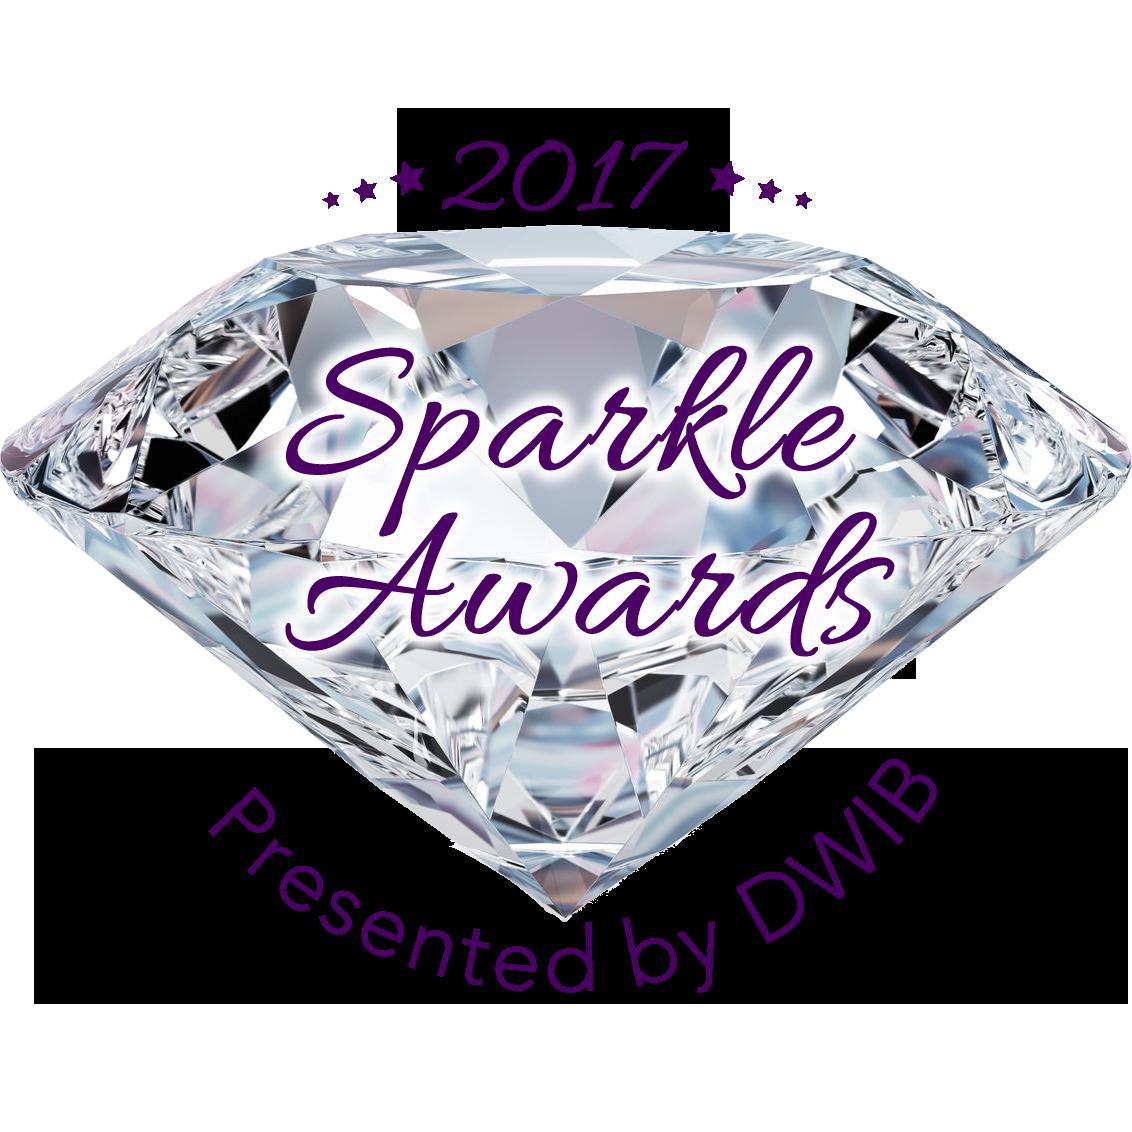 2017 Sparkle Award logo